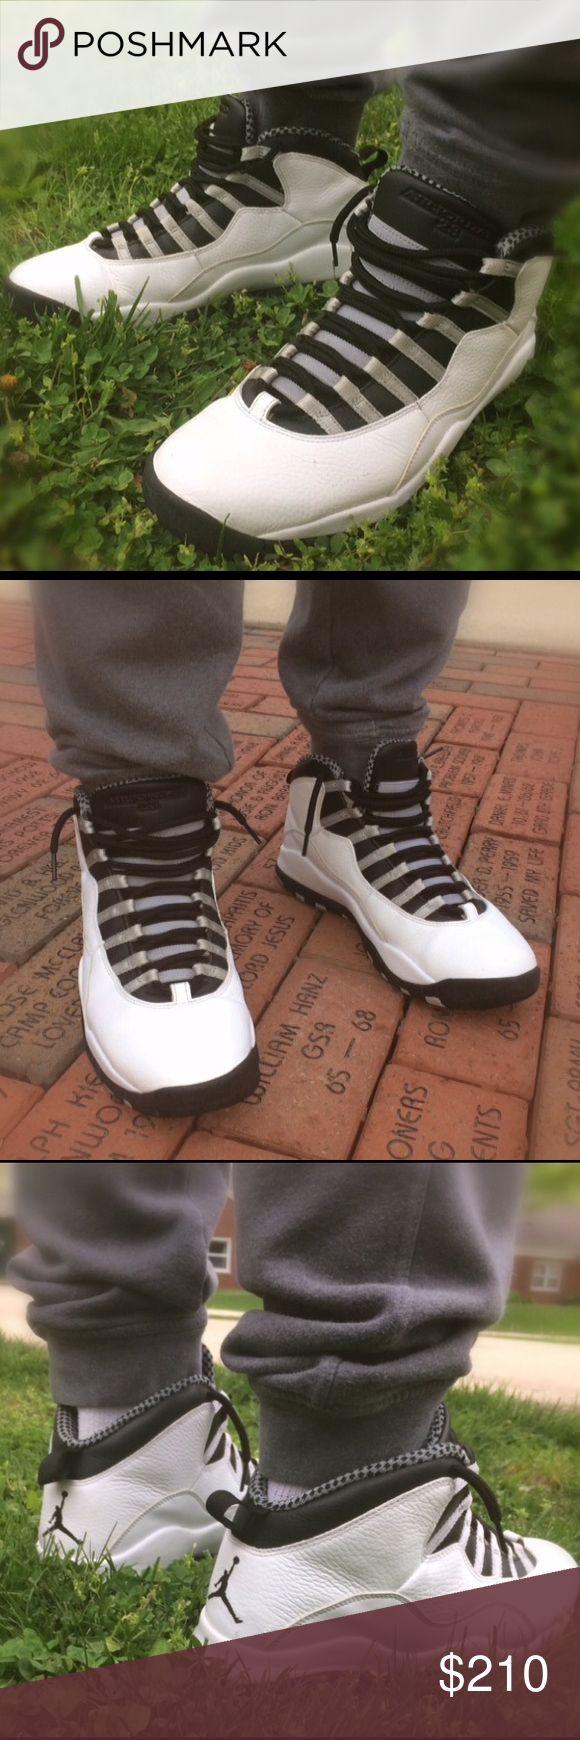 Jordan 10 Steel Pre-owned but in great condition 9/10 Jordan Shoes Sneakers